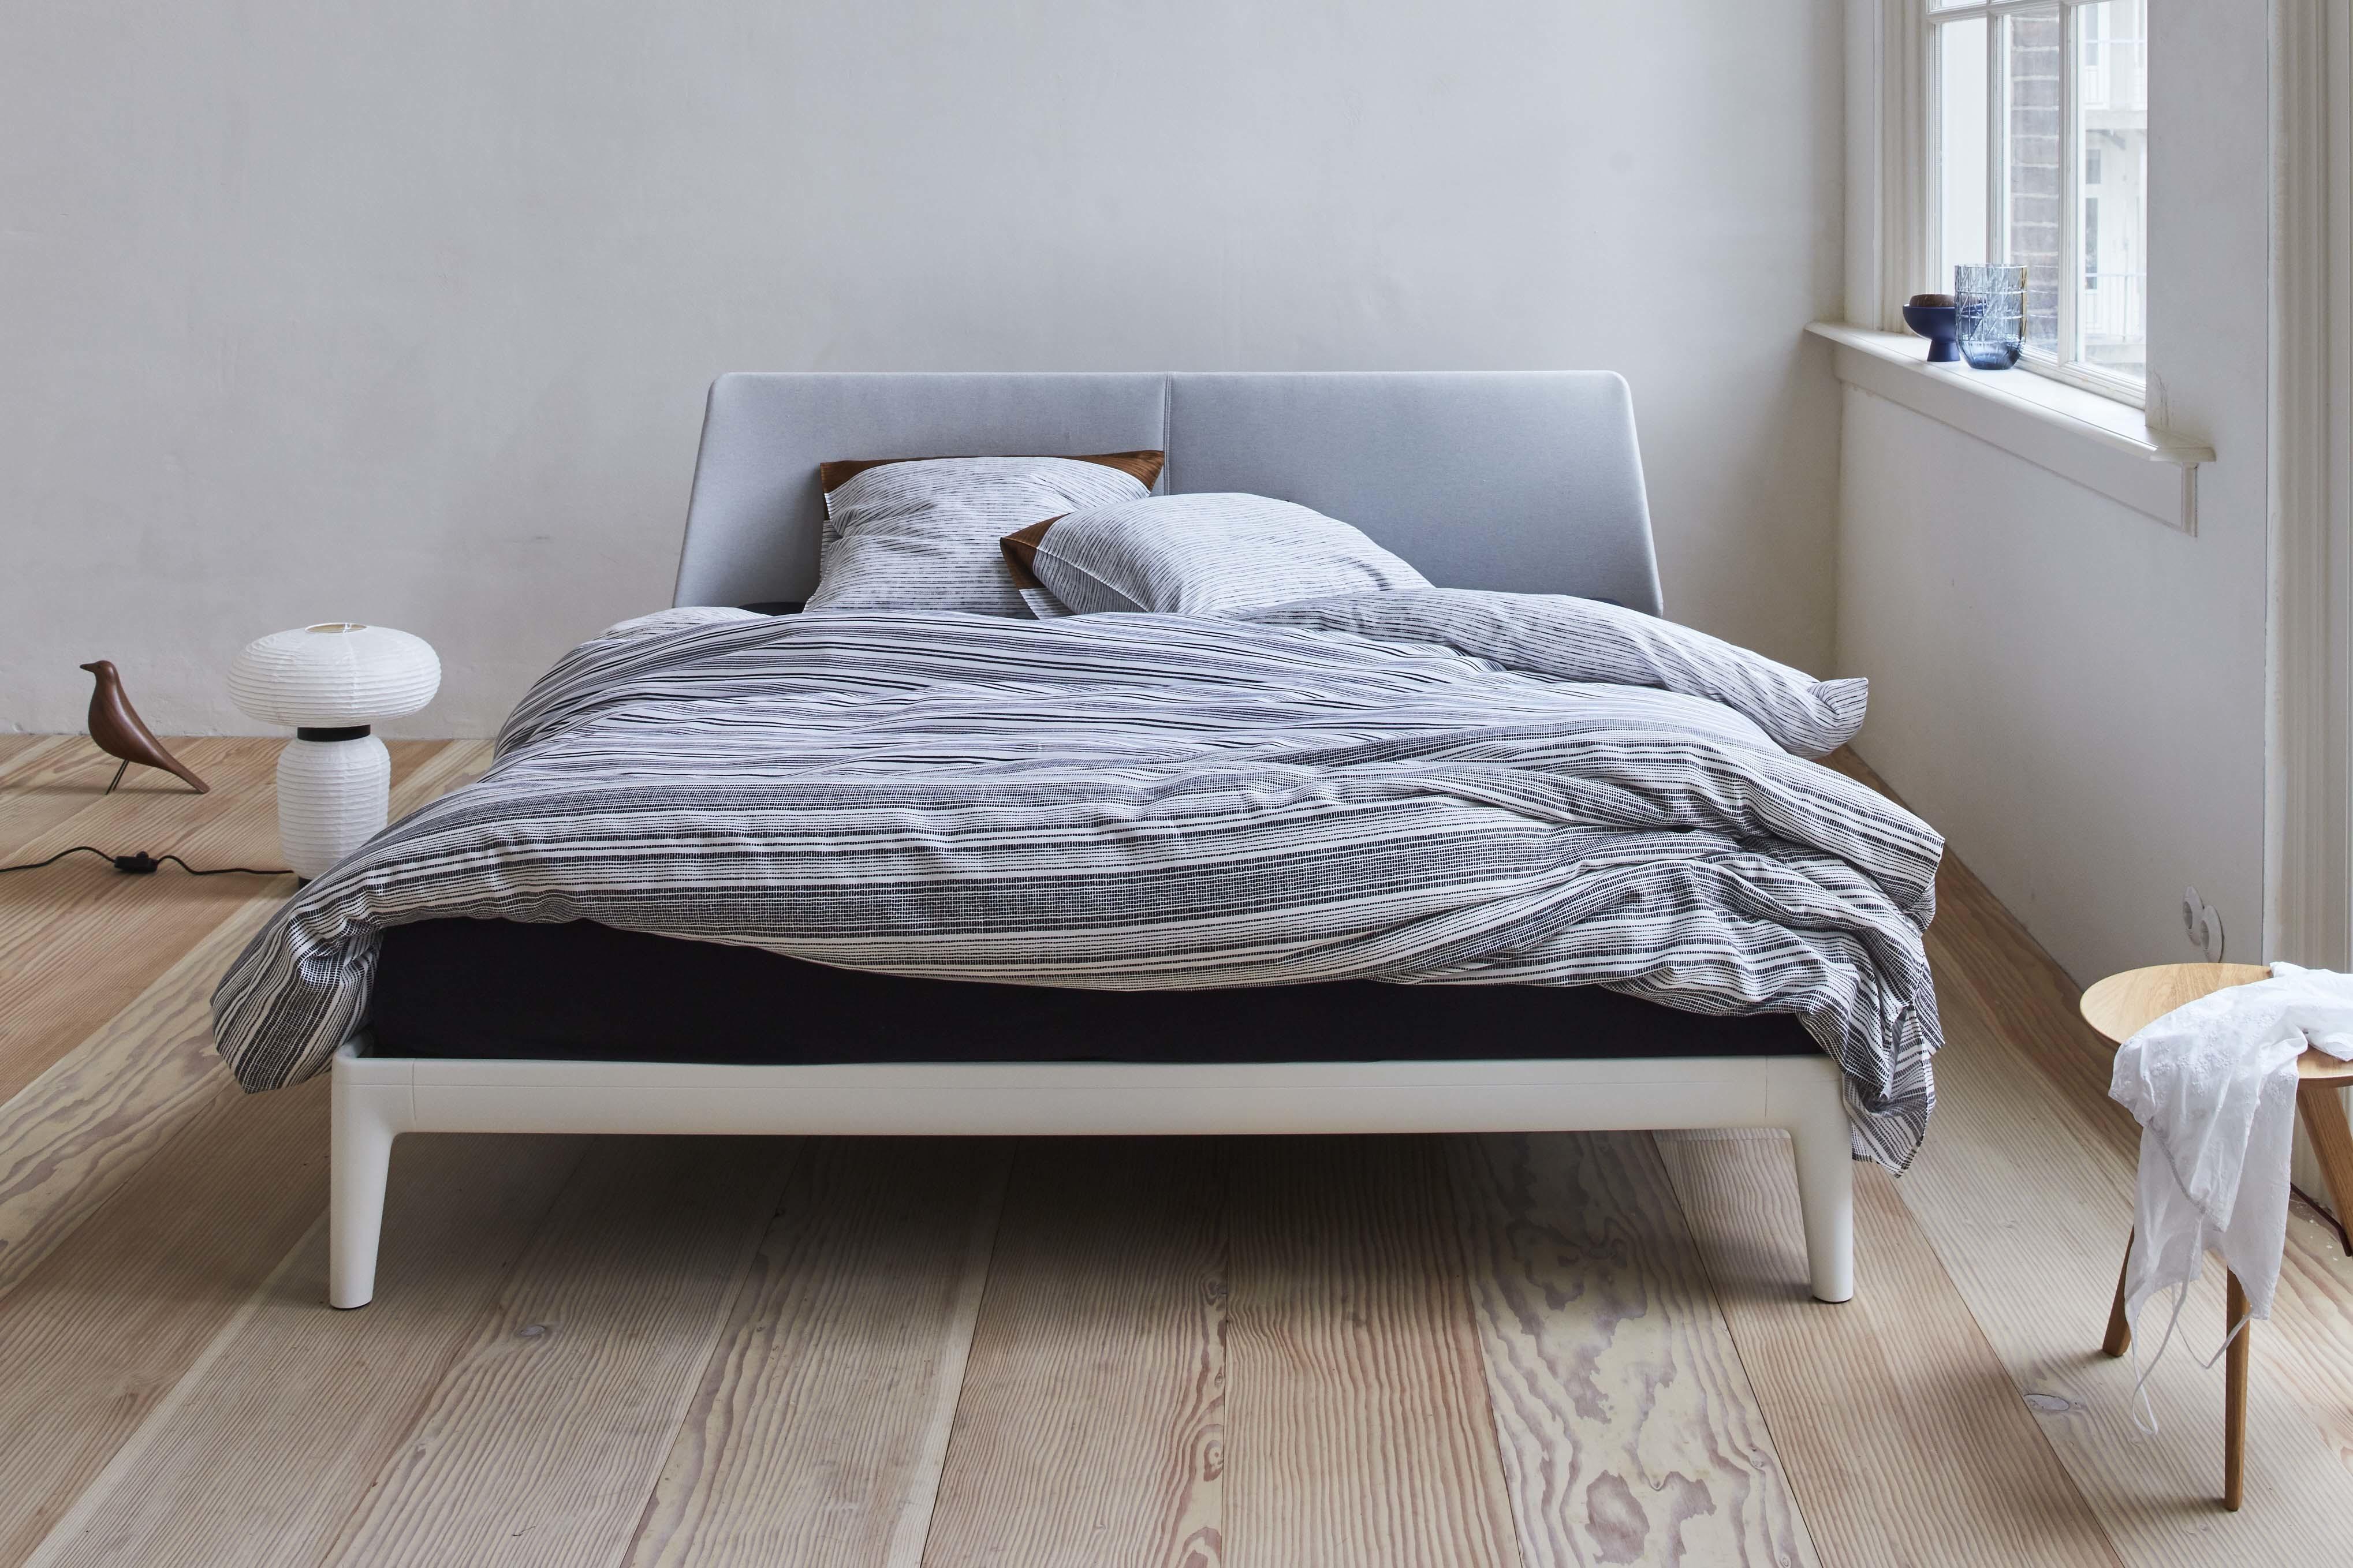 auping bed kopen